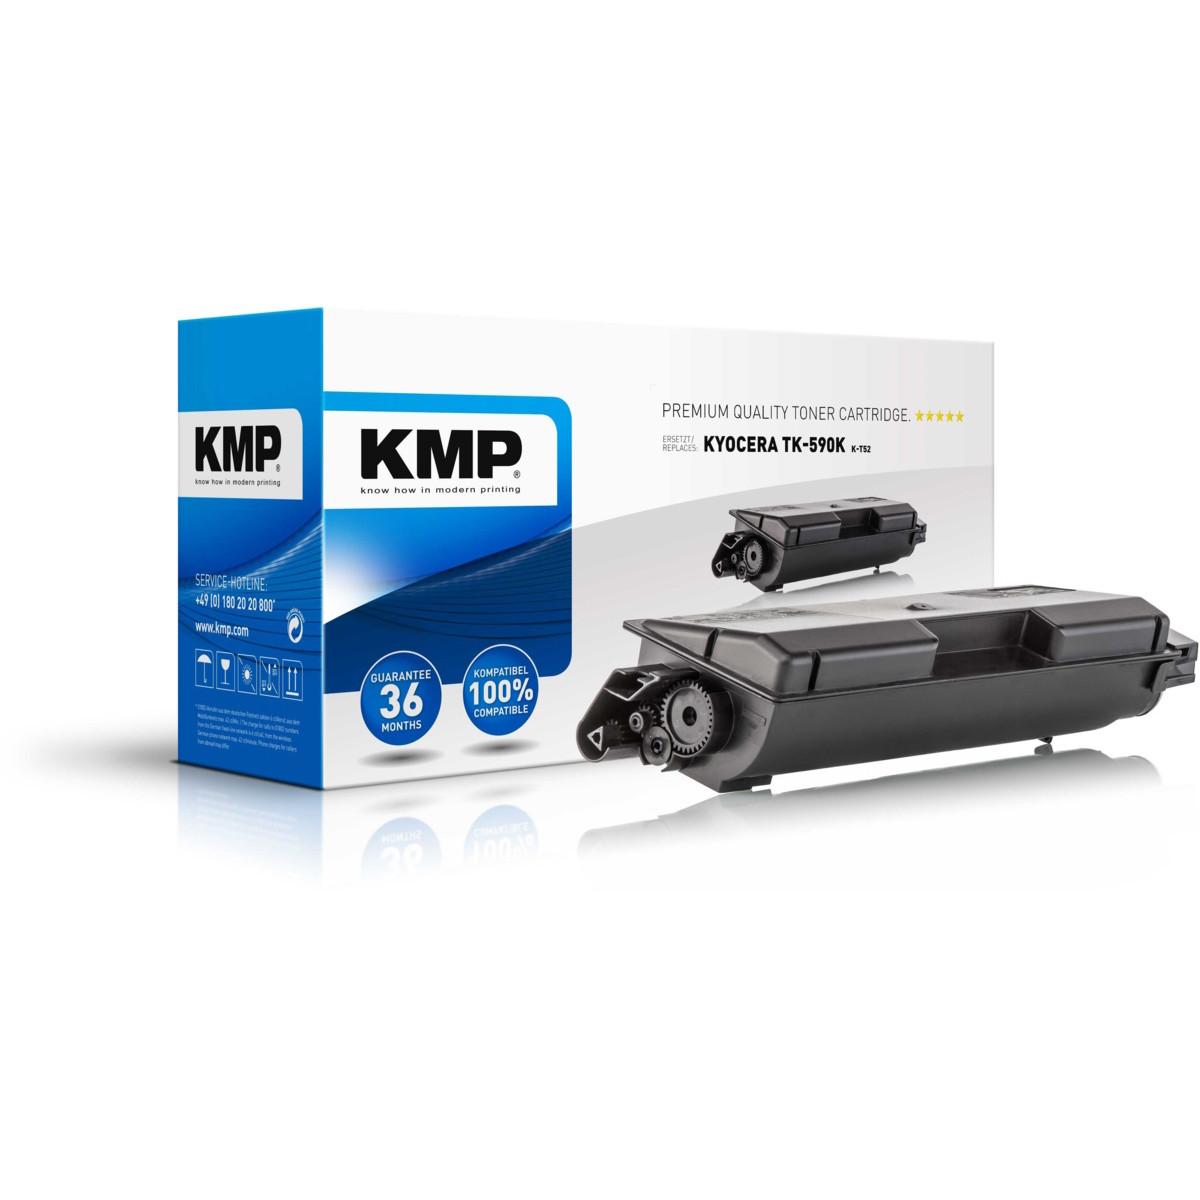 KMP Toner Kyocera TK-590K, - kompatibilný s čipom (Čierna)